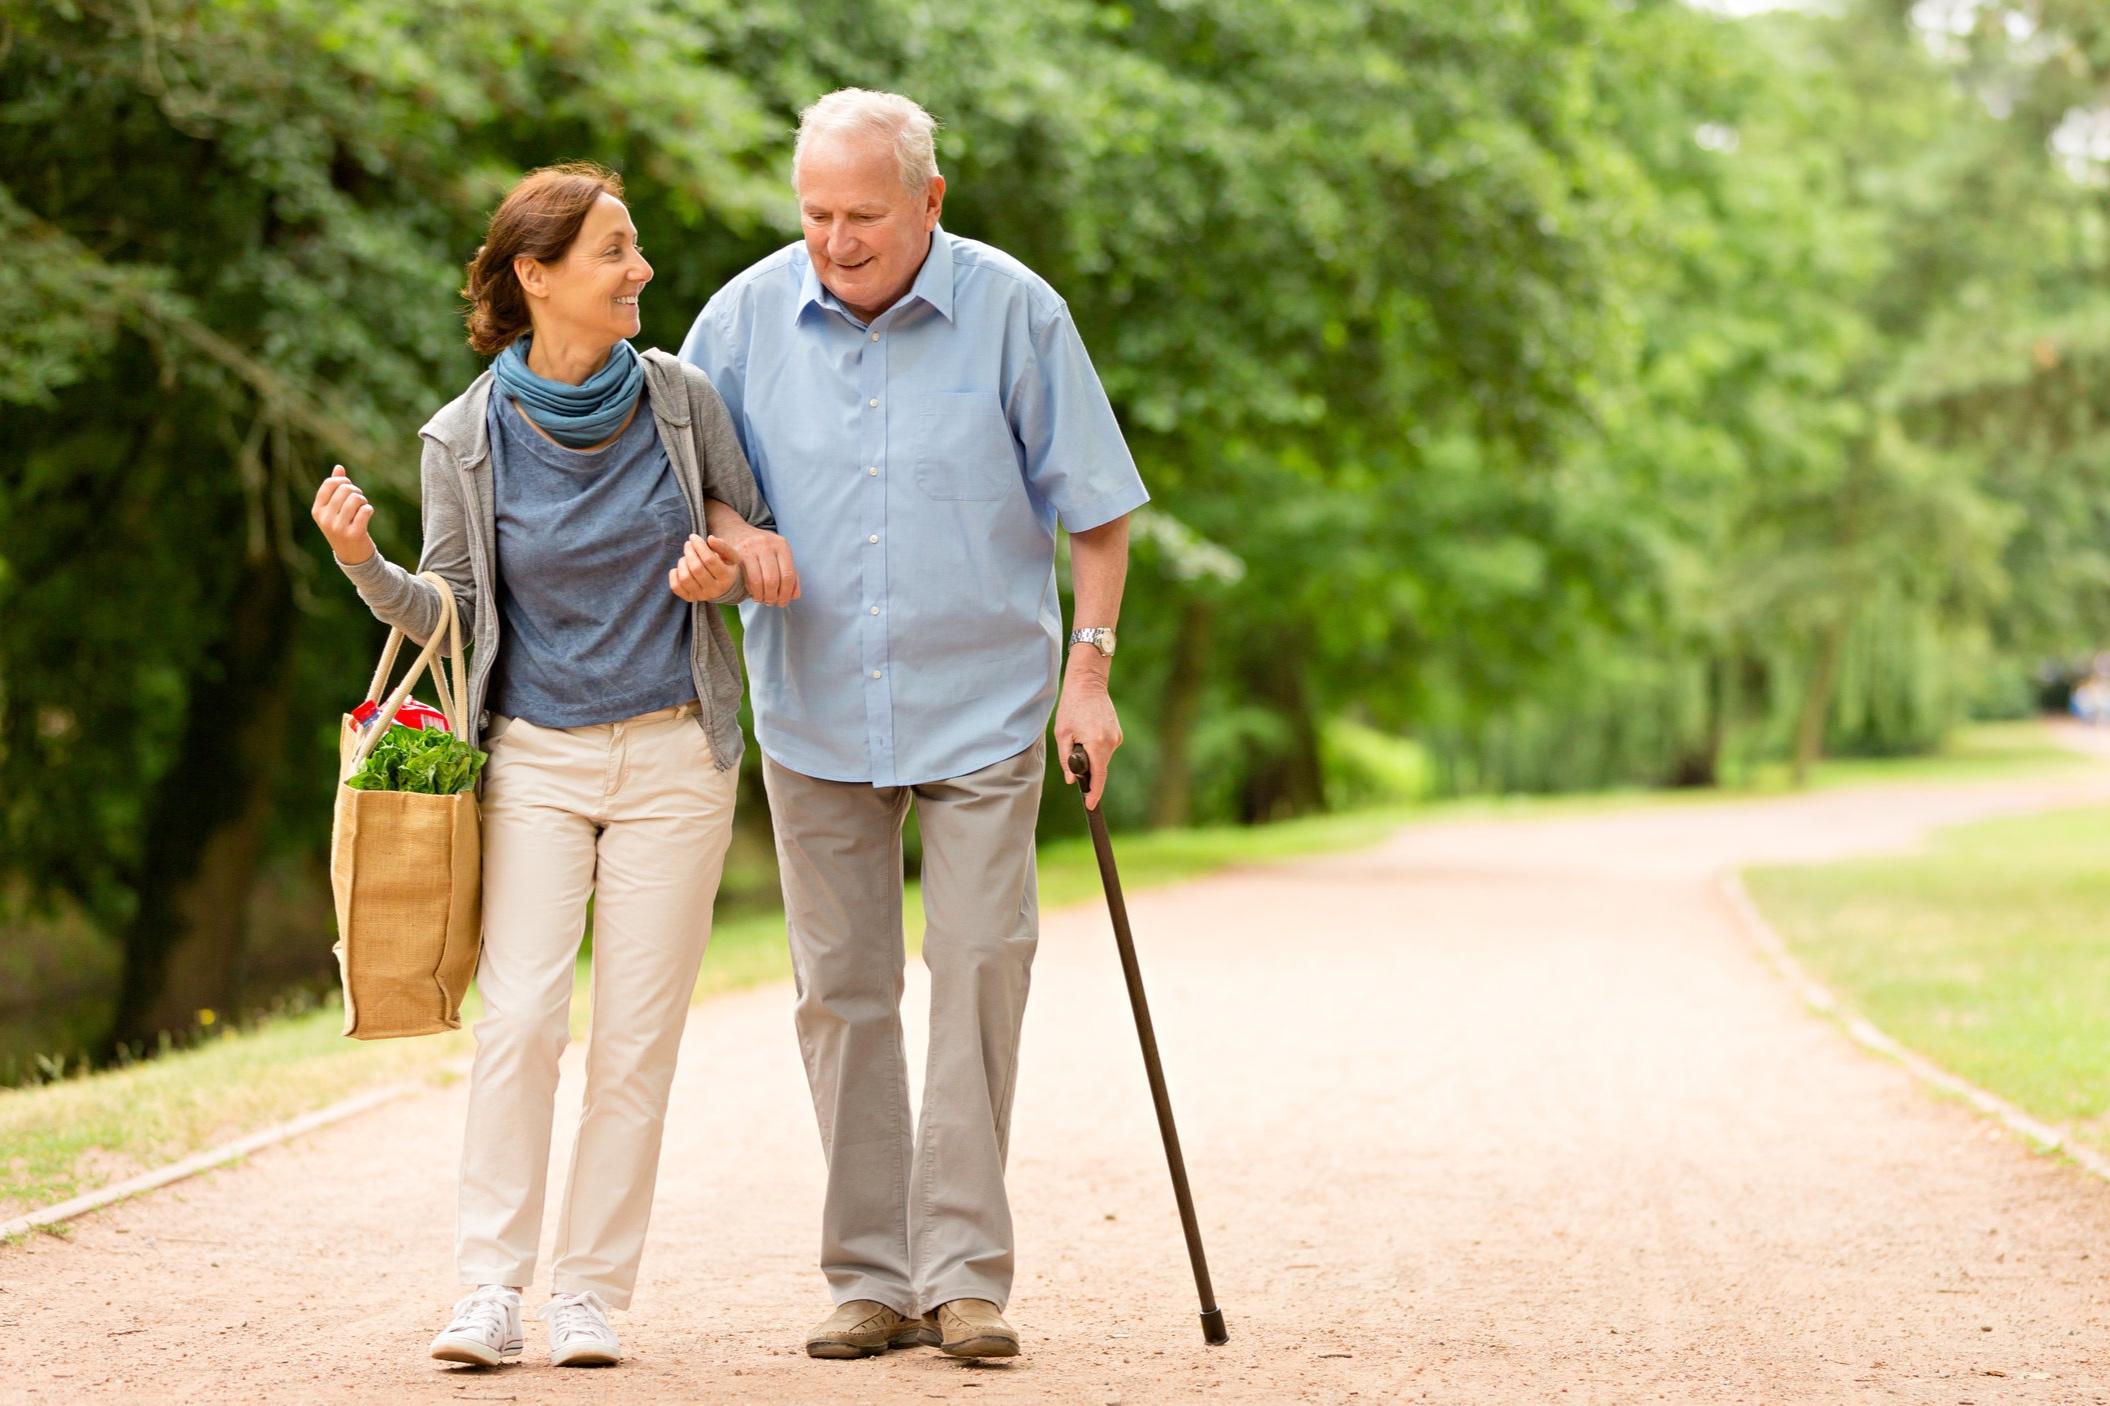 staffordshire-mobility-walking-aids.jpg